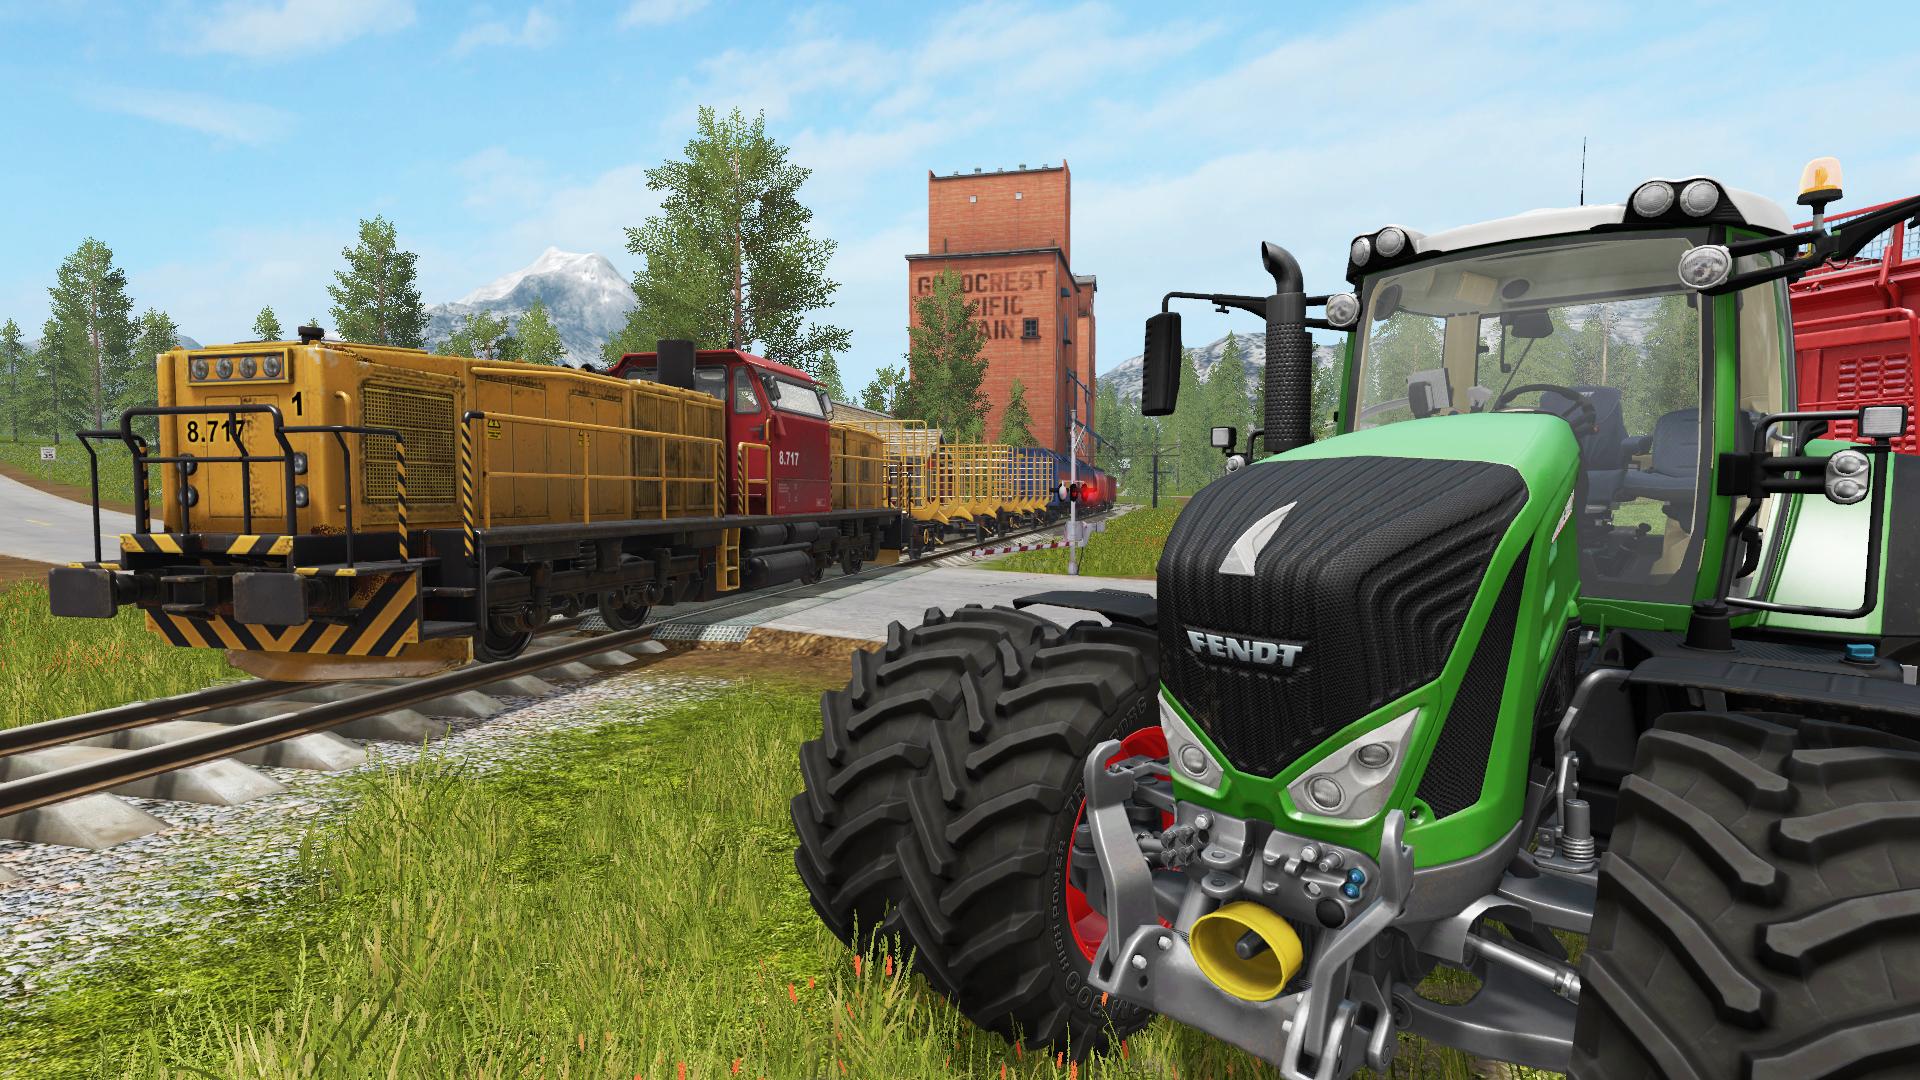 模拟农场 Farming Simulator 19 1.6.0 Mac 破解版 - 农耕模拟游戏